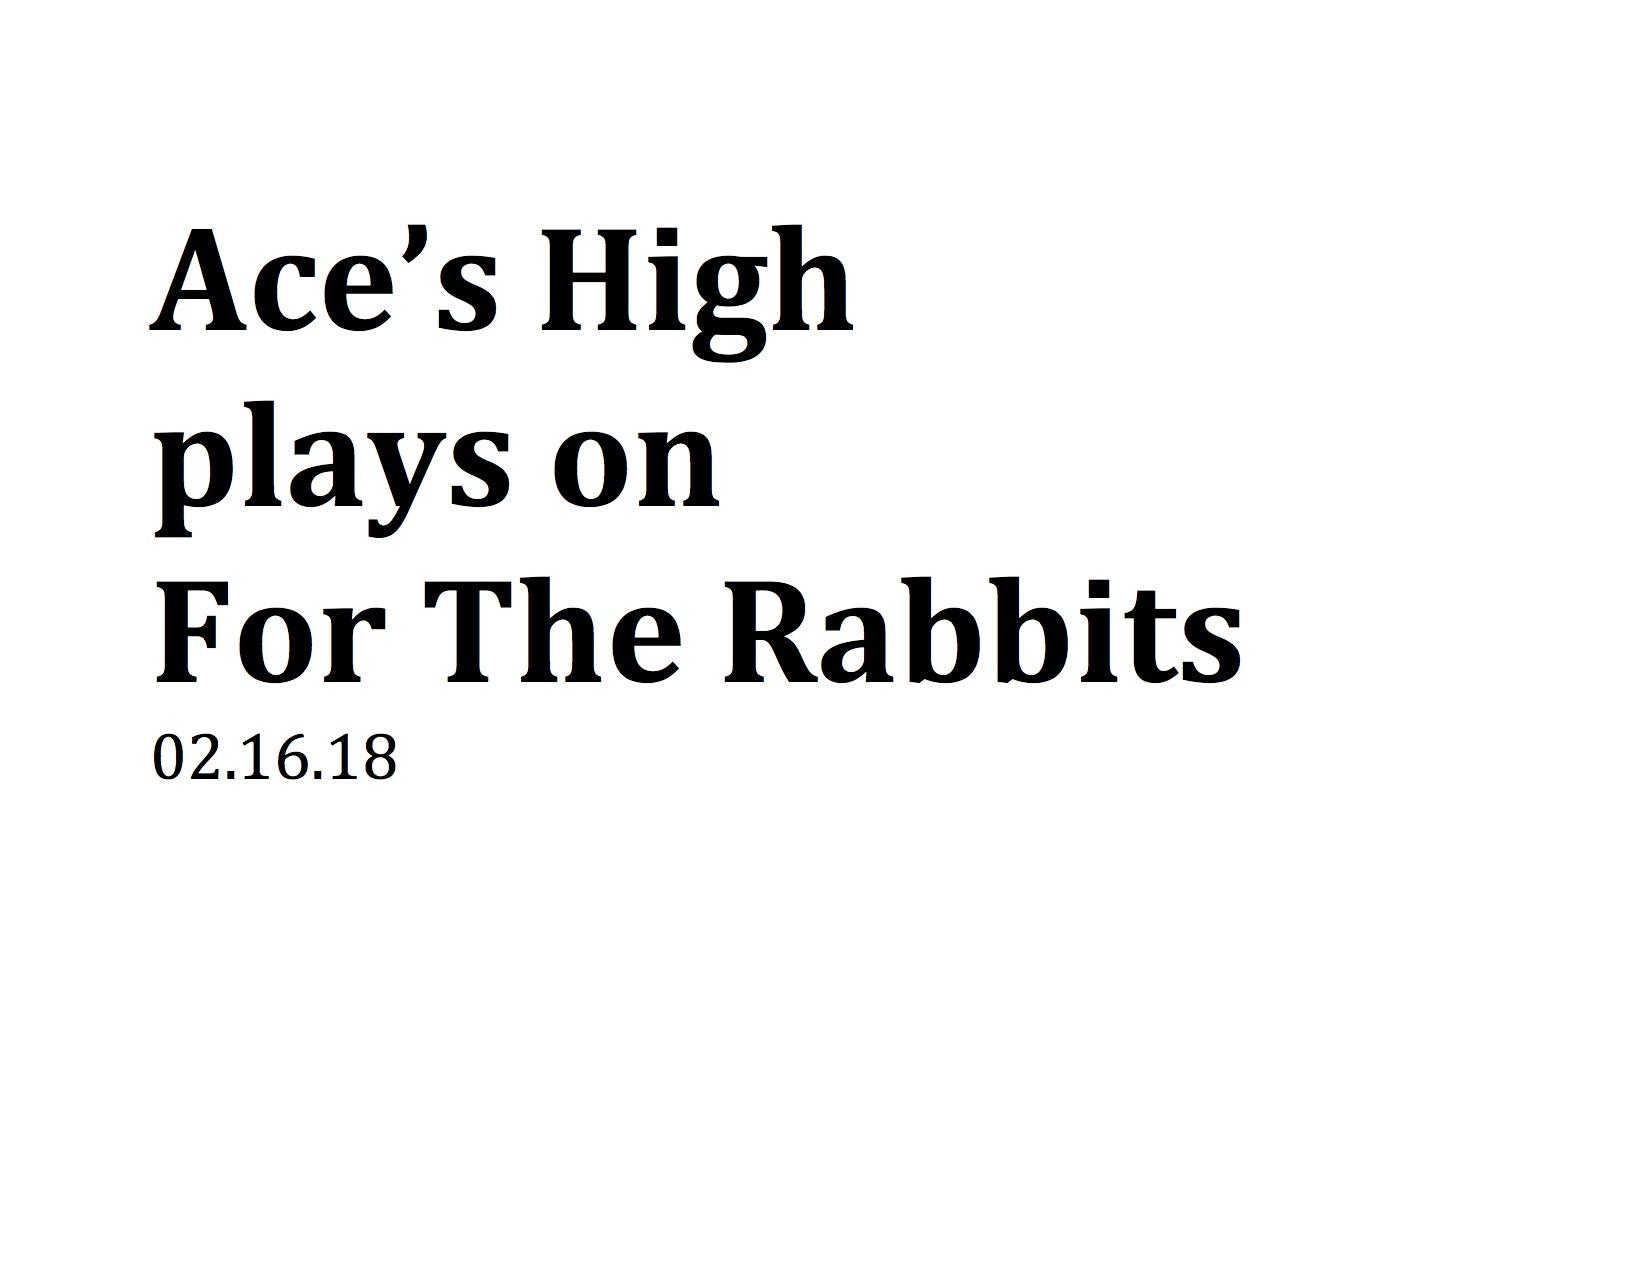 Ace's High rabbits.jpg